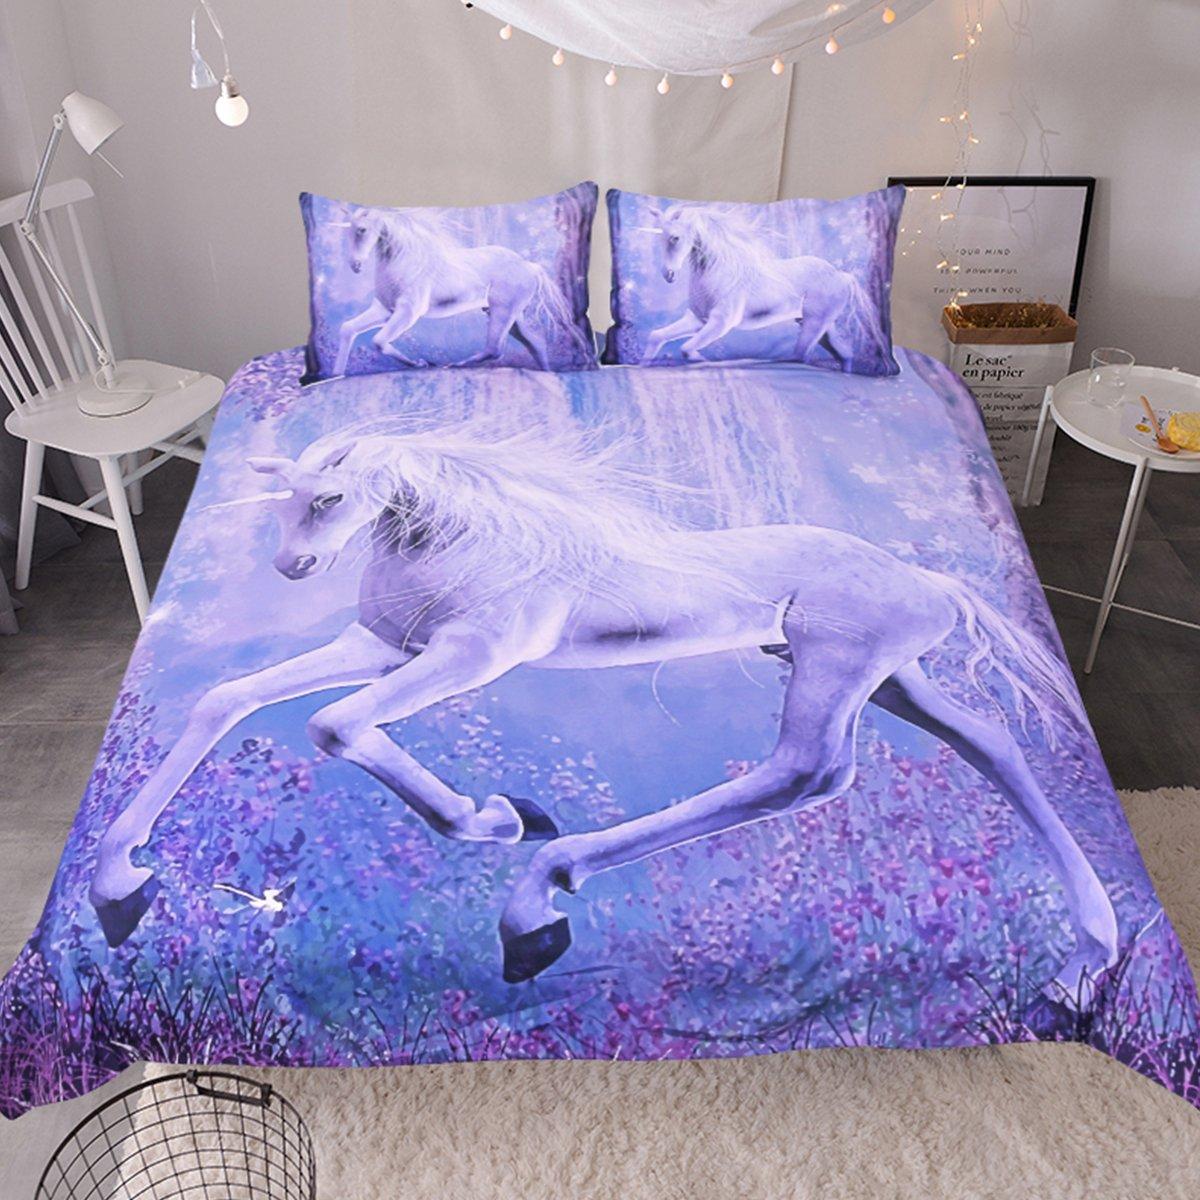 Sleepwish 3D Purple Unicorn Bedding Dreamy Lavender Unicorn Duvet Cover Teen Fantasy Animal Art Bed Comforter Cover Set (King)